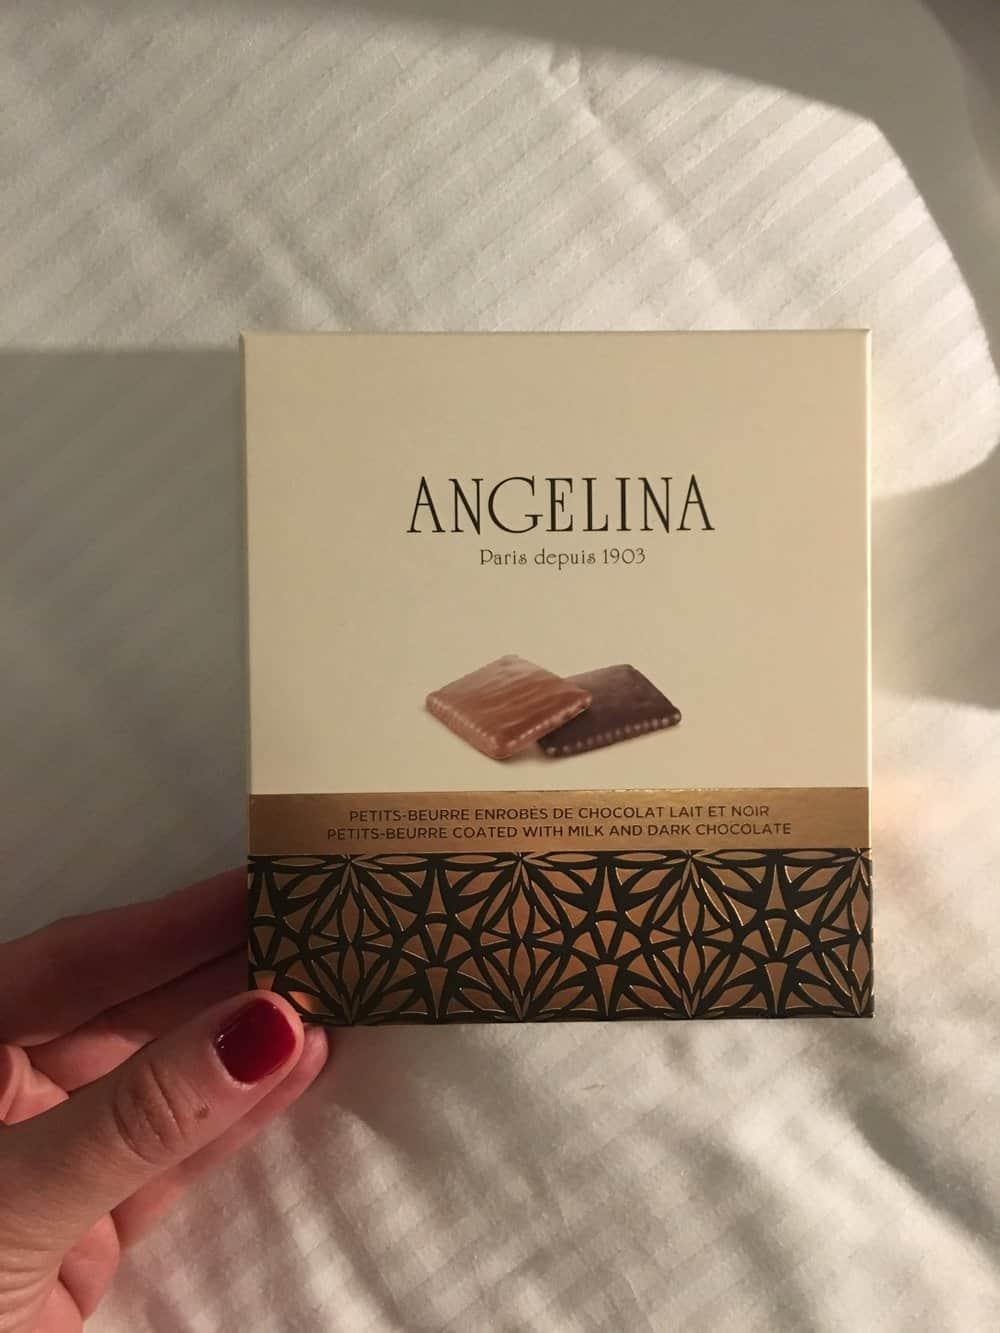 angelina paris france chocolates